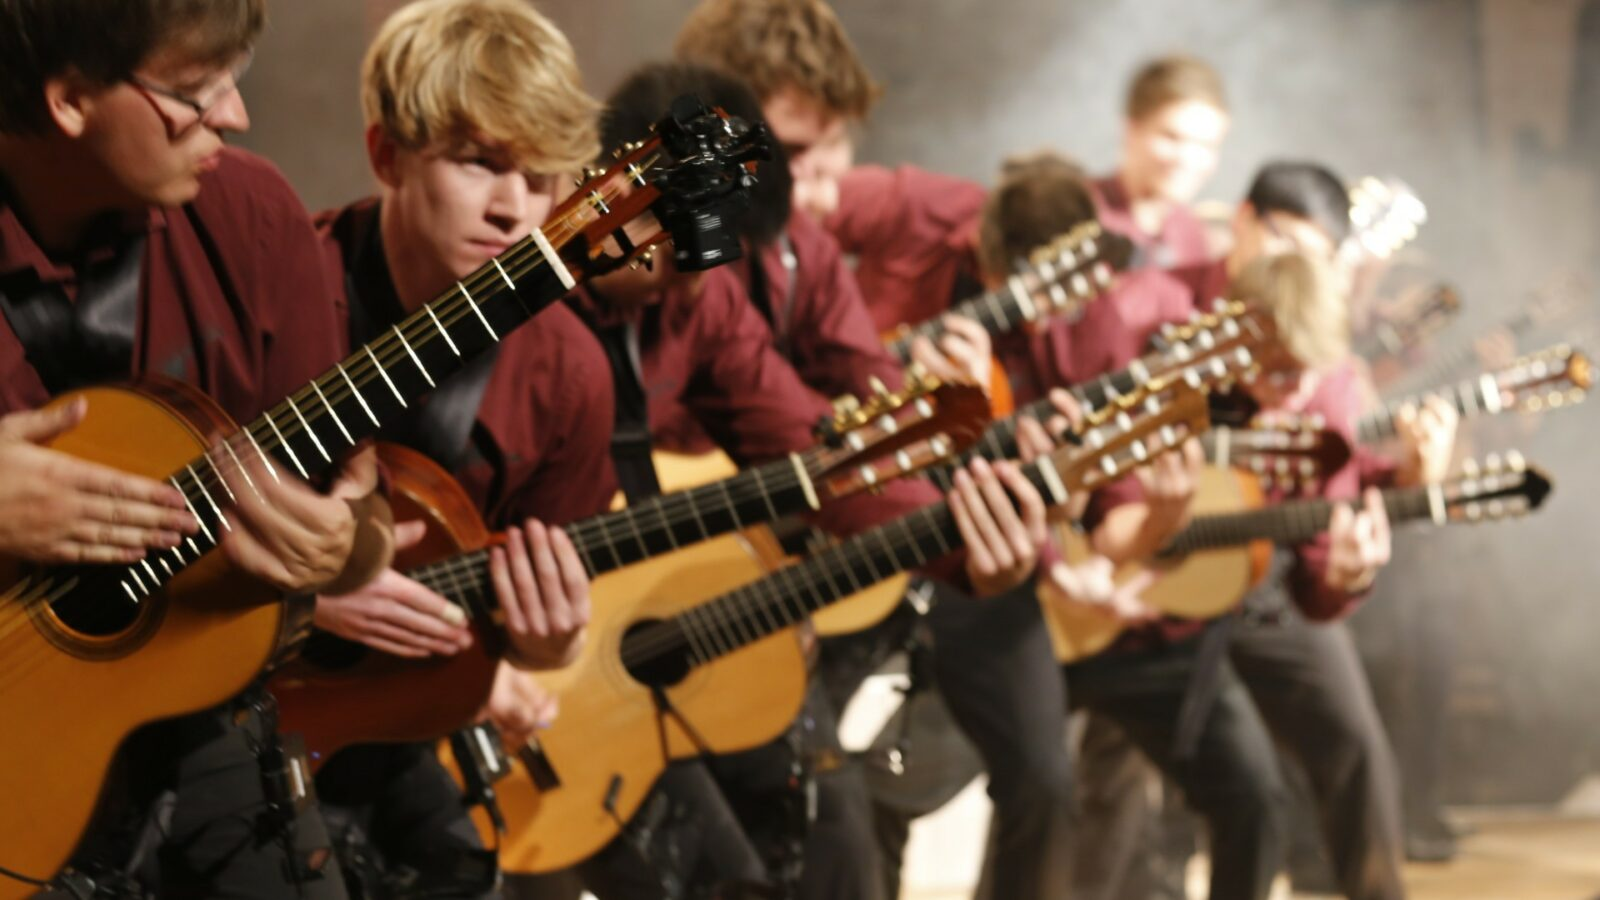 JGOH-Unplugged3 Credit Michael Böhm